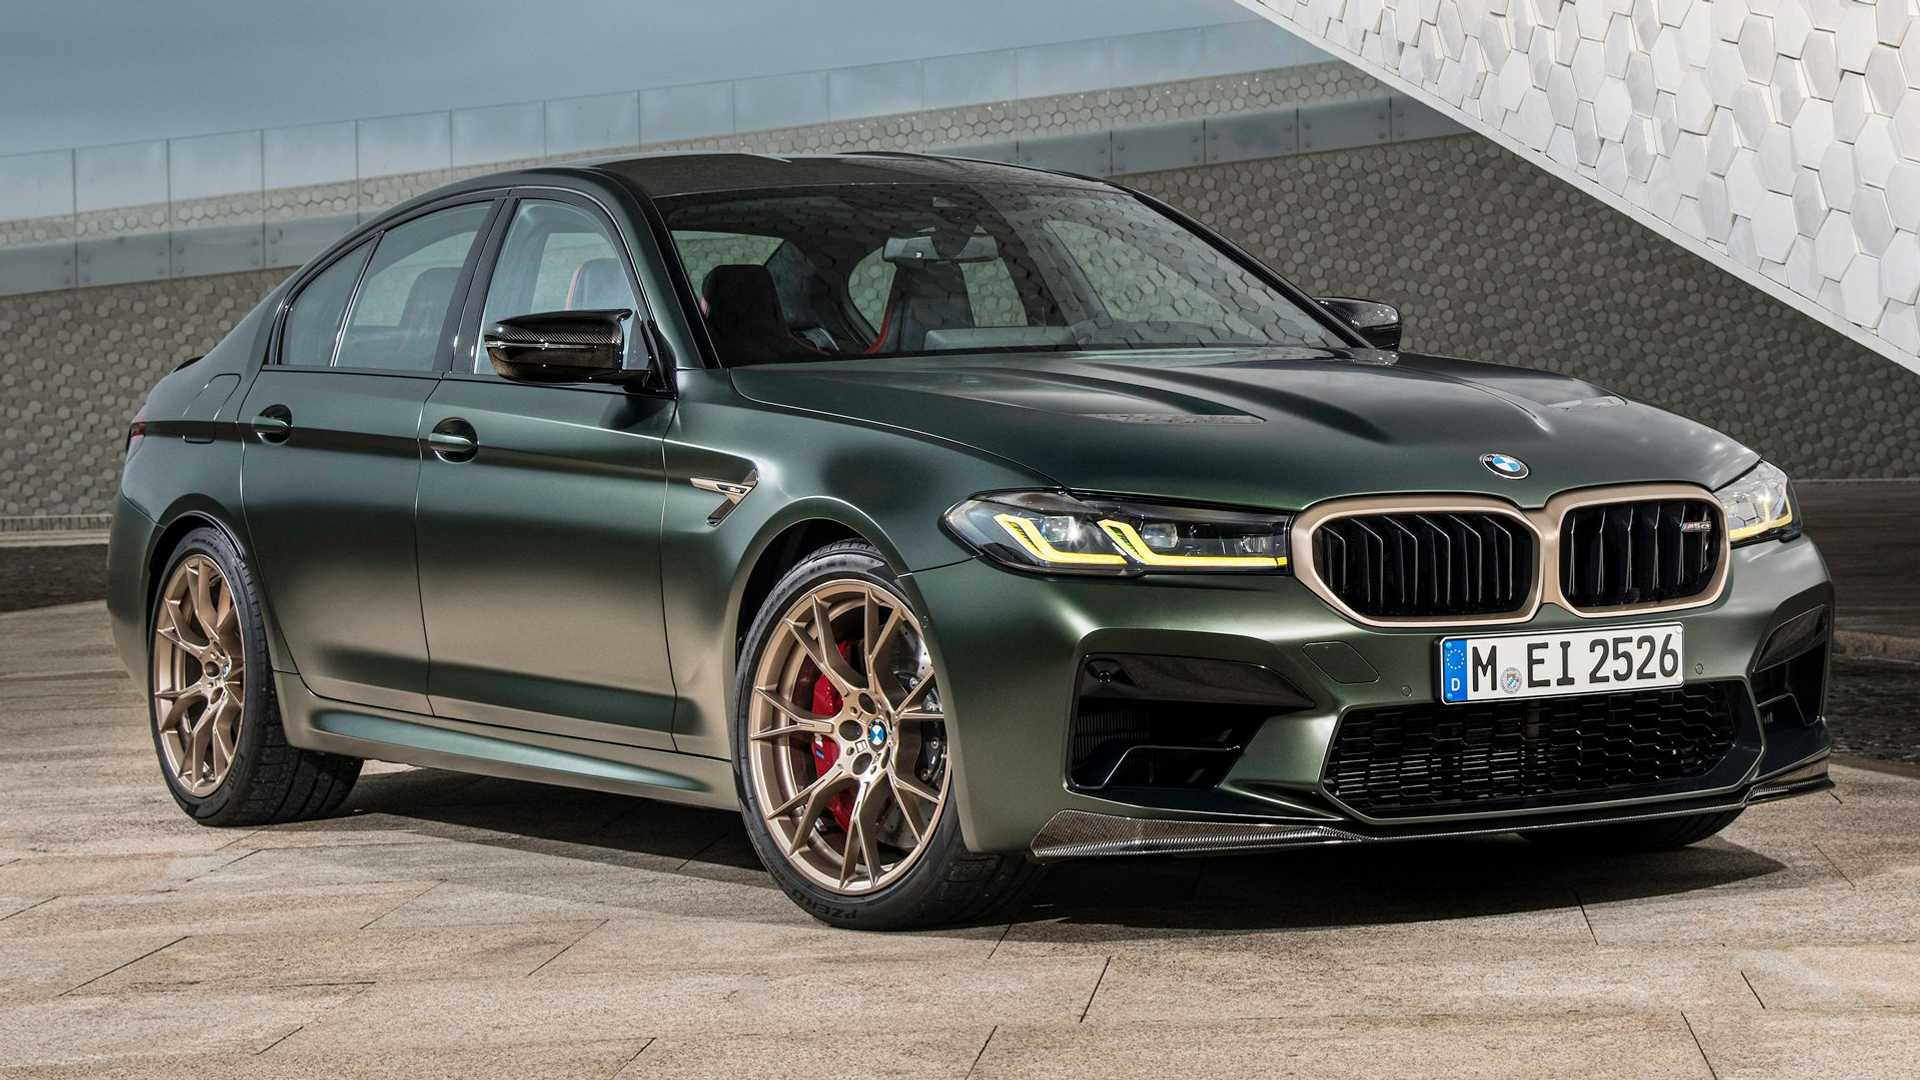 BMW M5 CS: Πόσο κοστίζει η ισχυρότερη BMW όλων των εποχών στην Ελλάδα; (video)